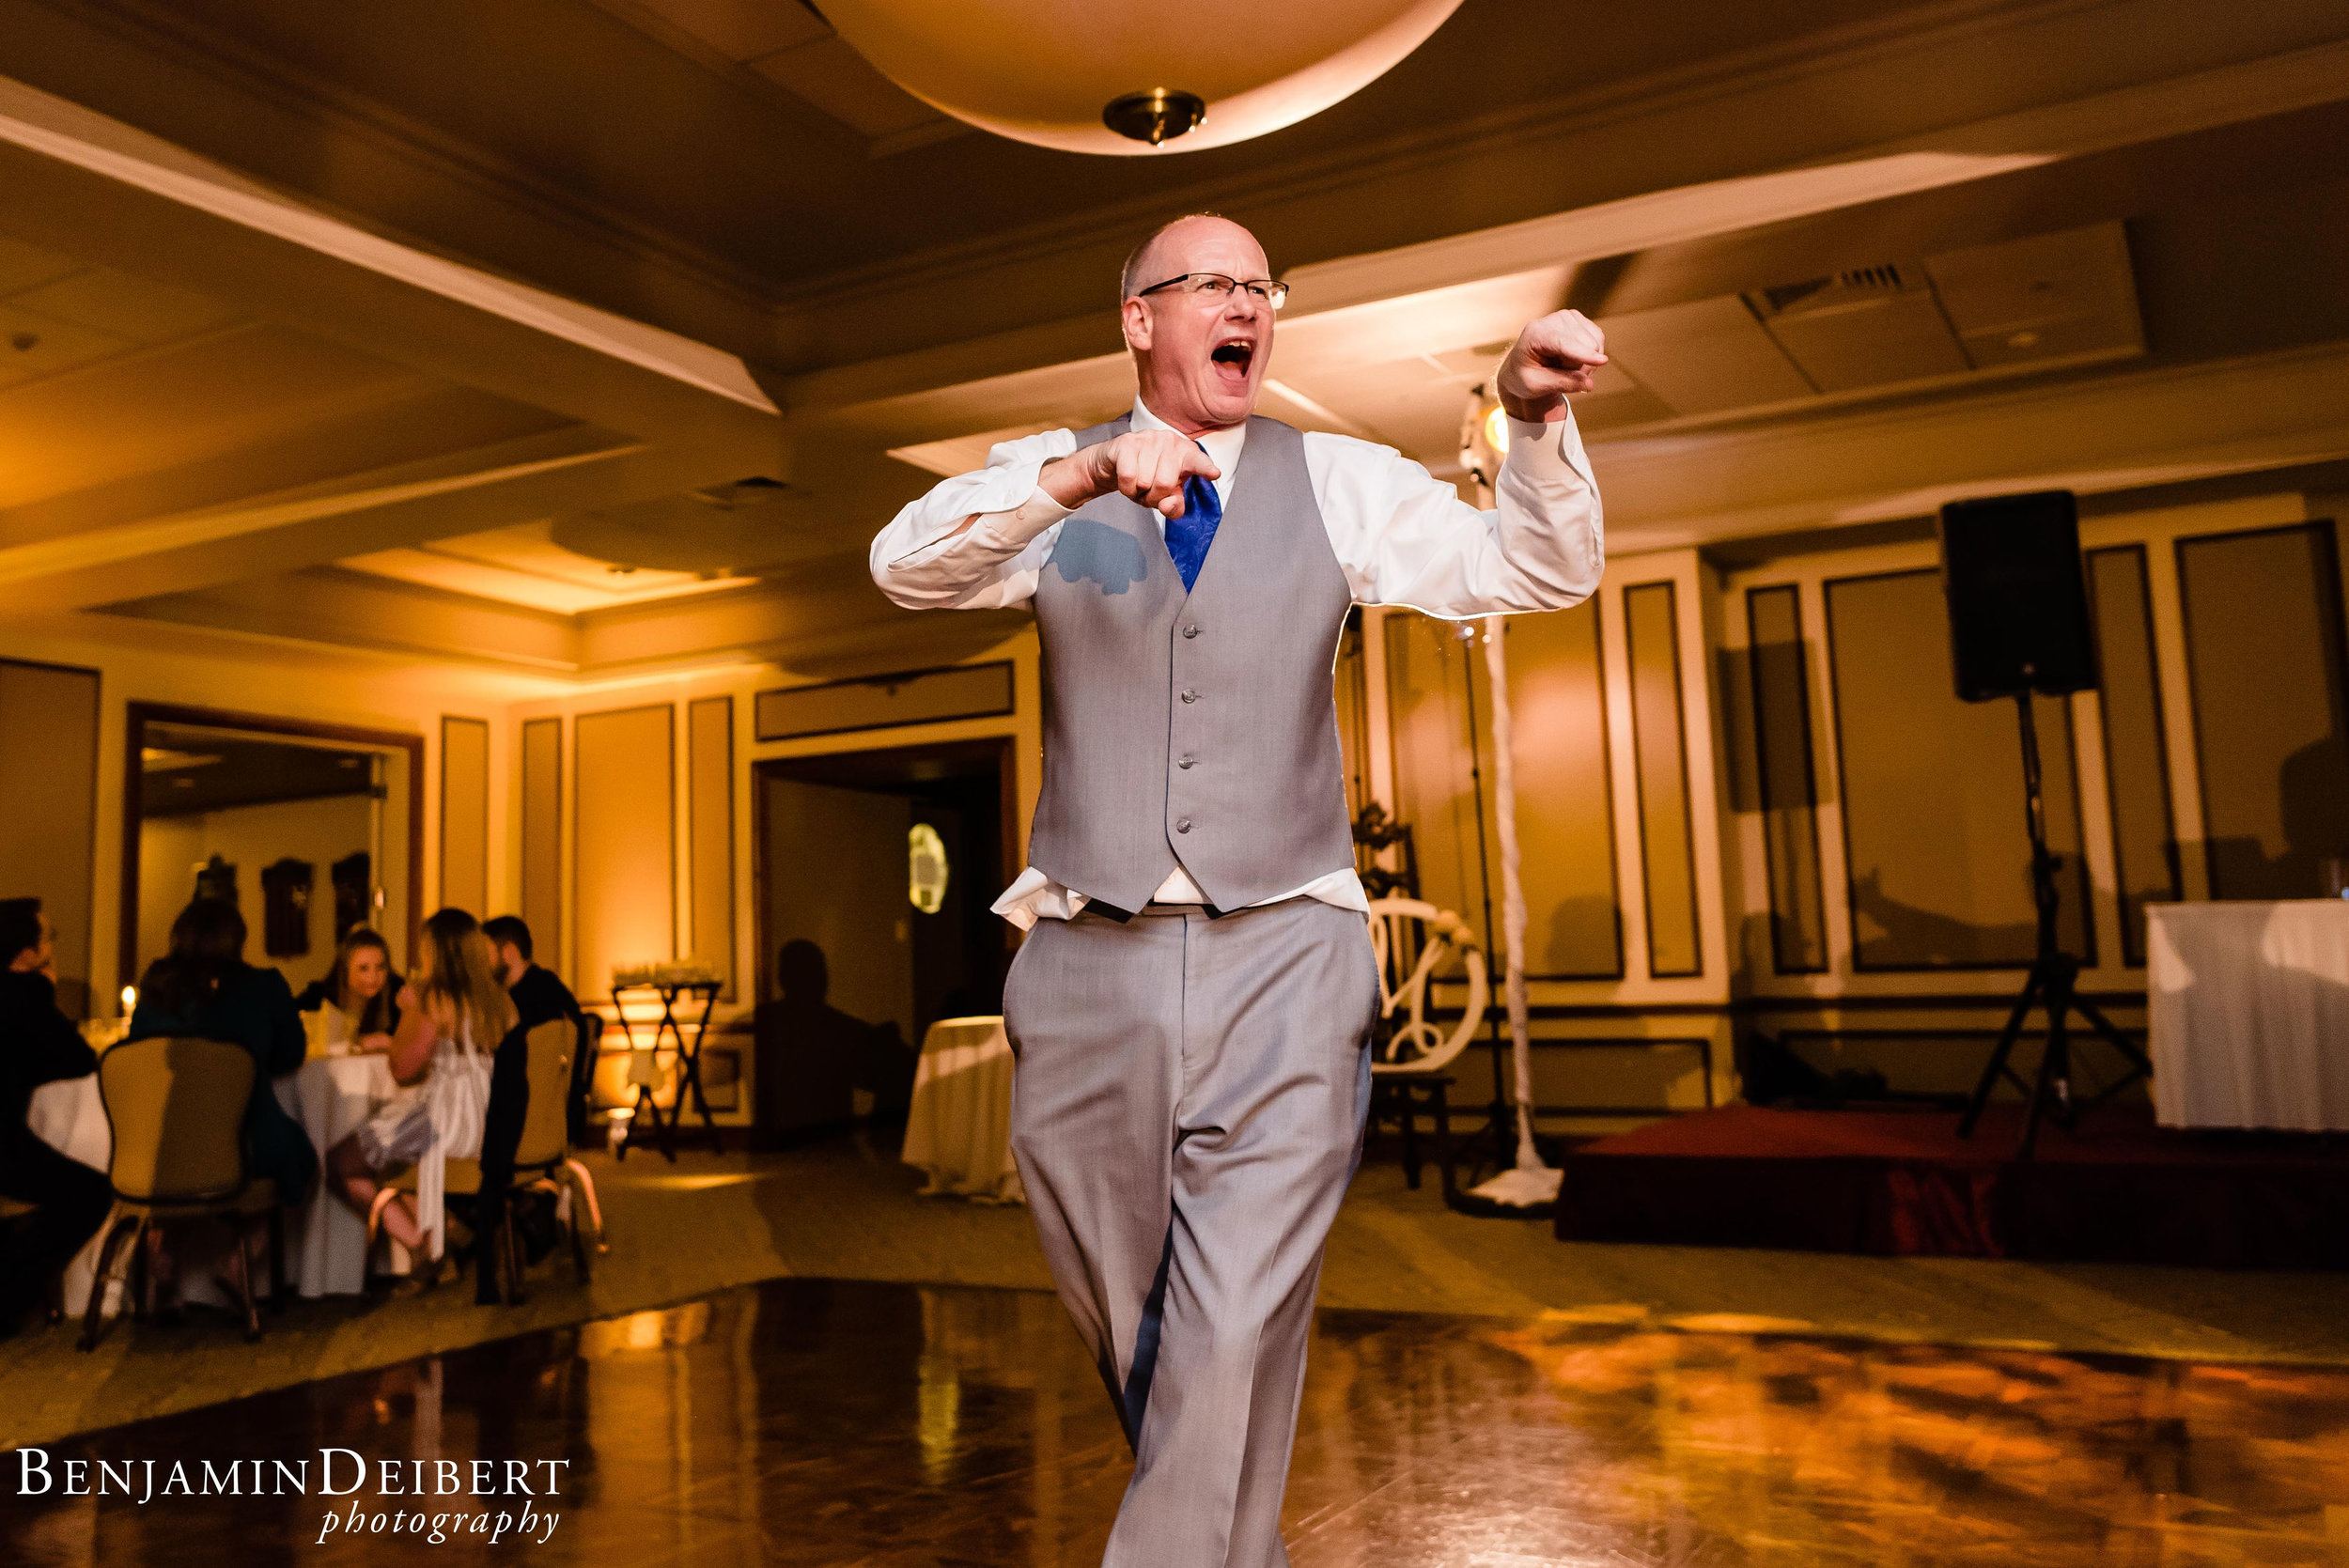 AshleyandDerrick_RadnorValleyCountryClub_Wedding-83.jpg